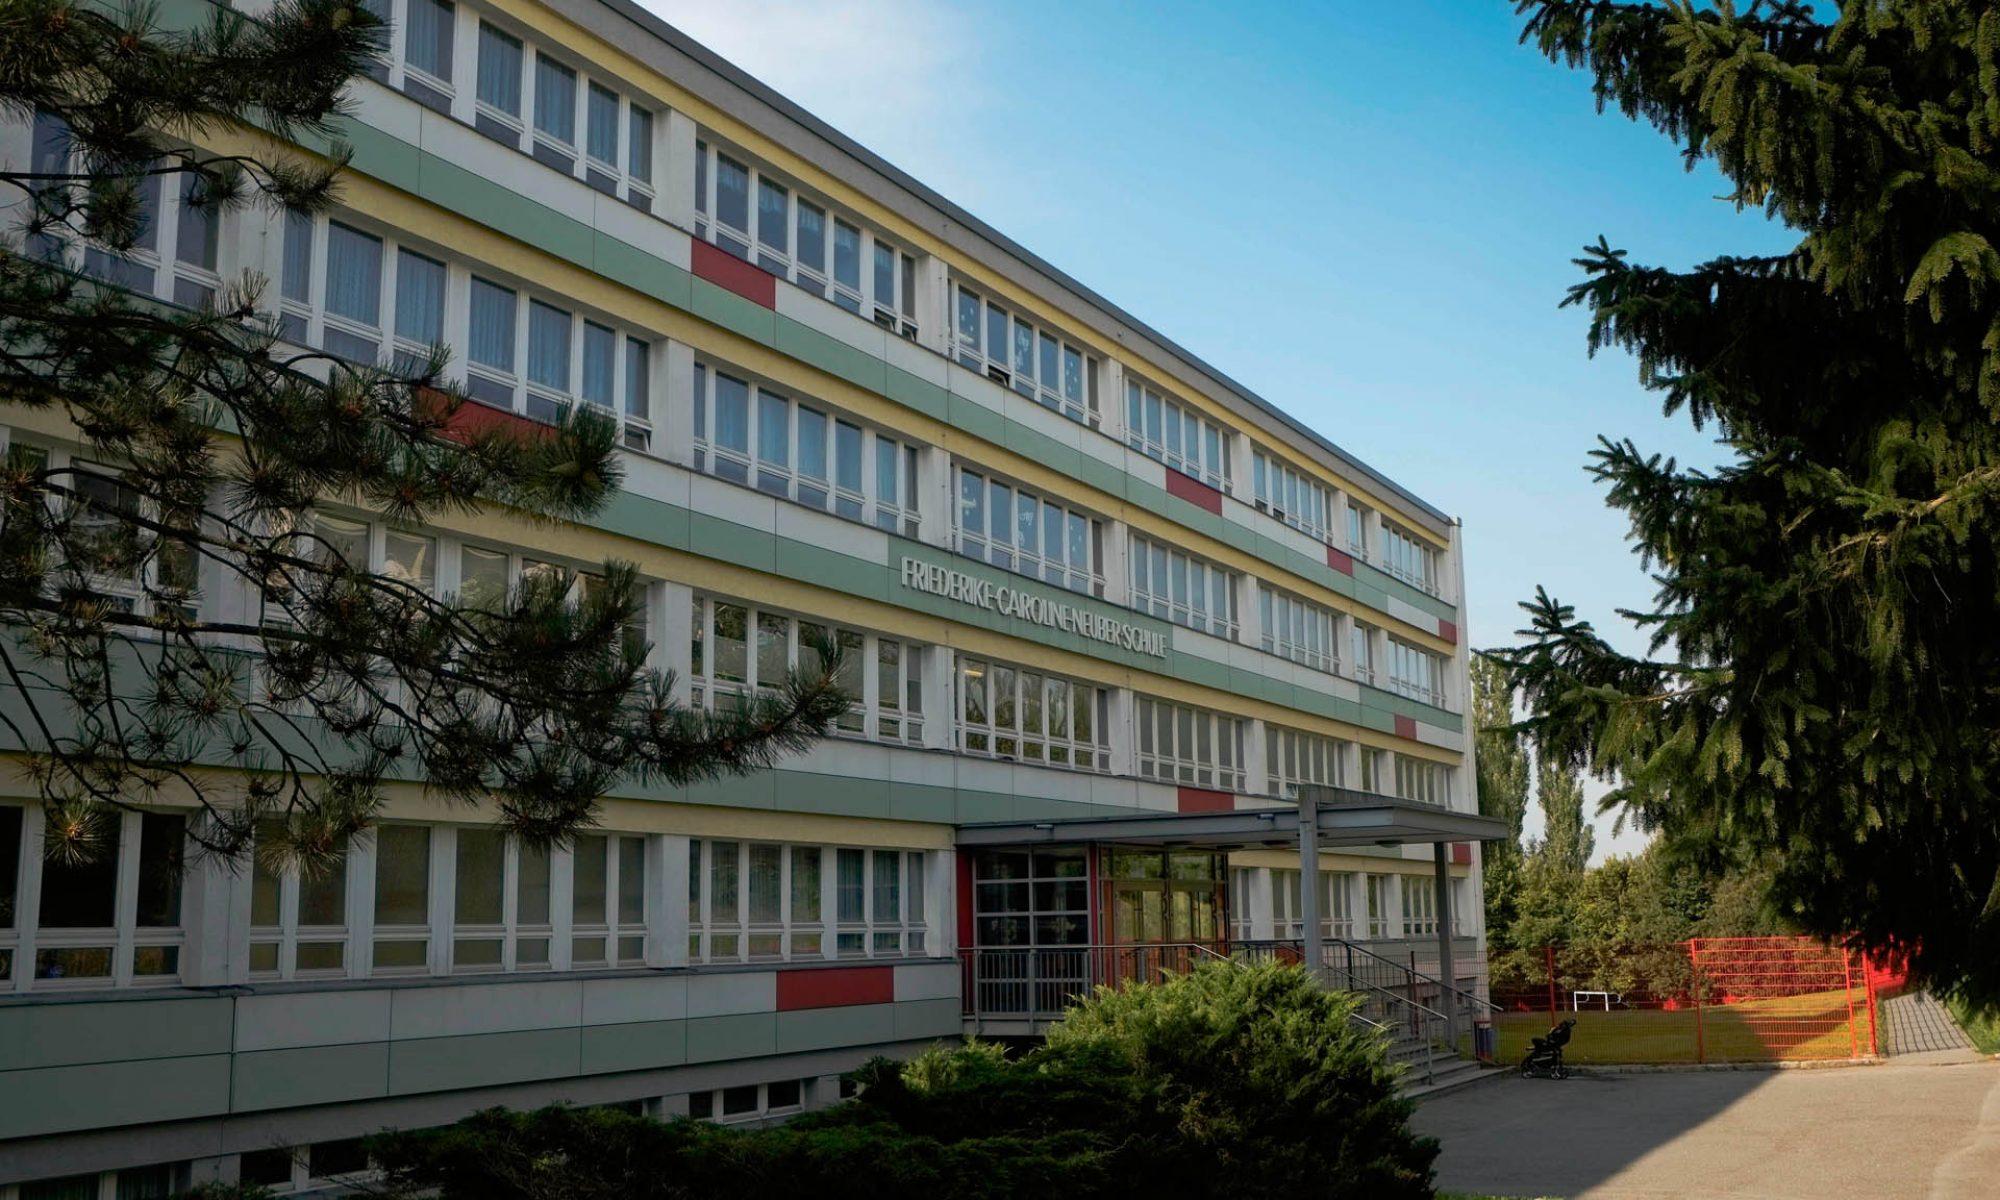 Neuberschule Reichenbach